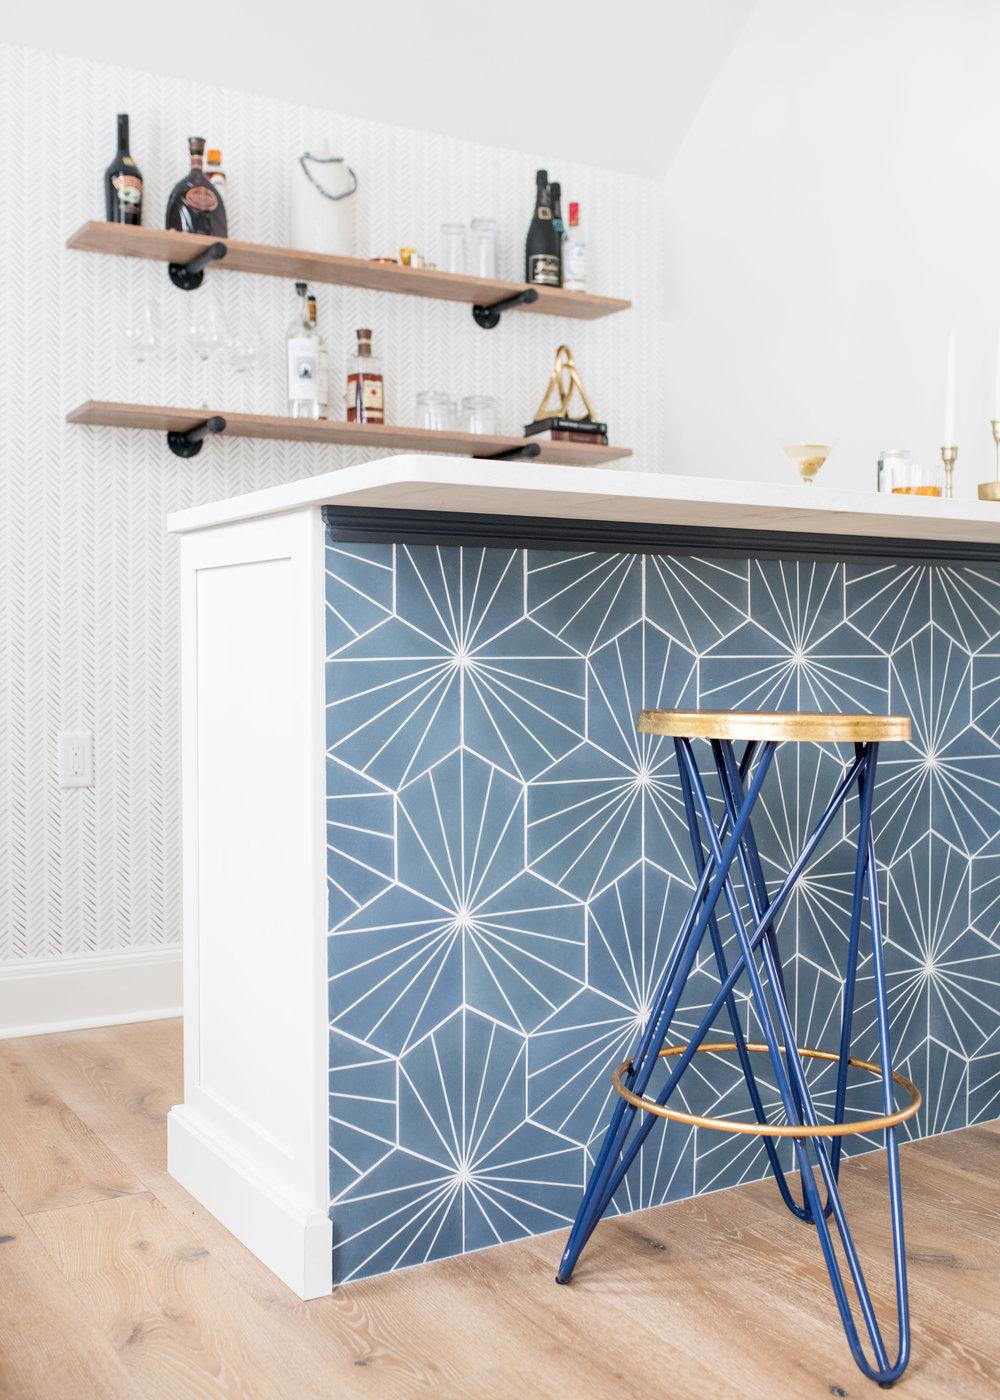 Bar Renovation / Interior Design Andover MA  Gina Baran Interiors + Design